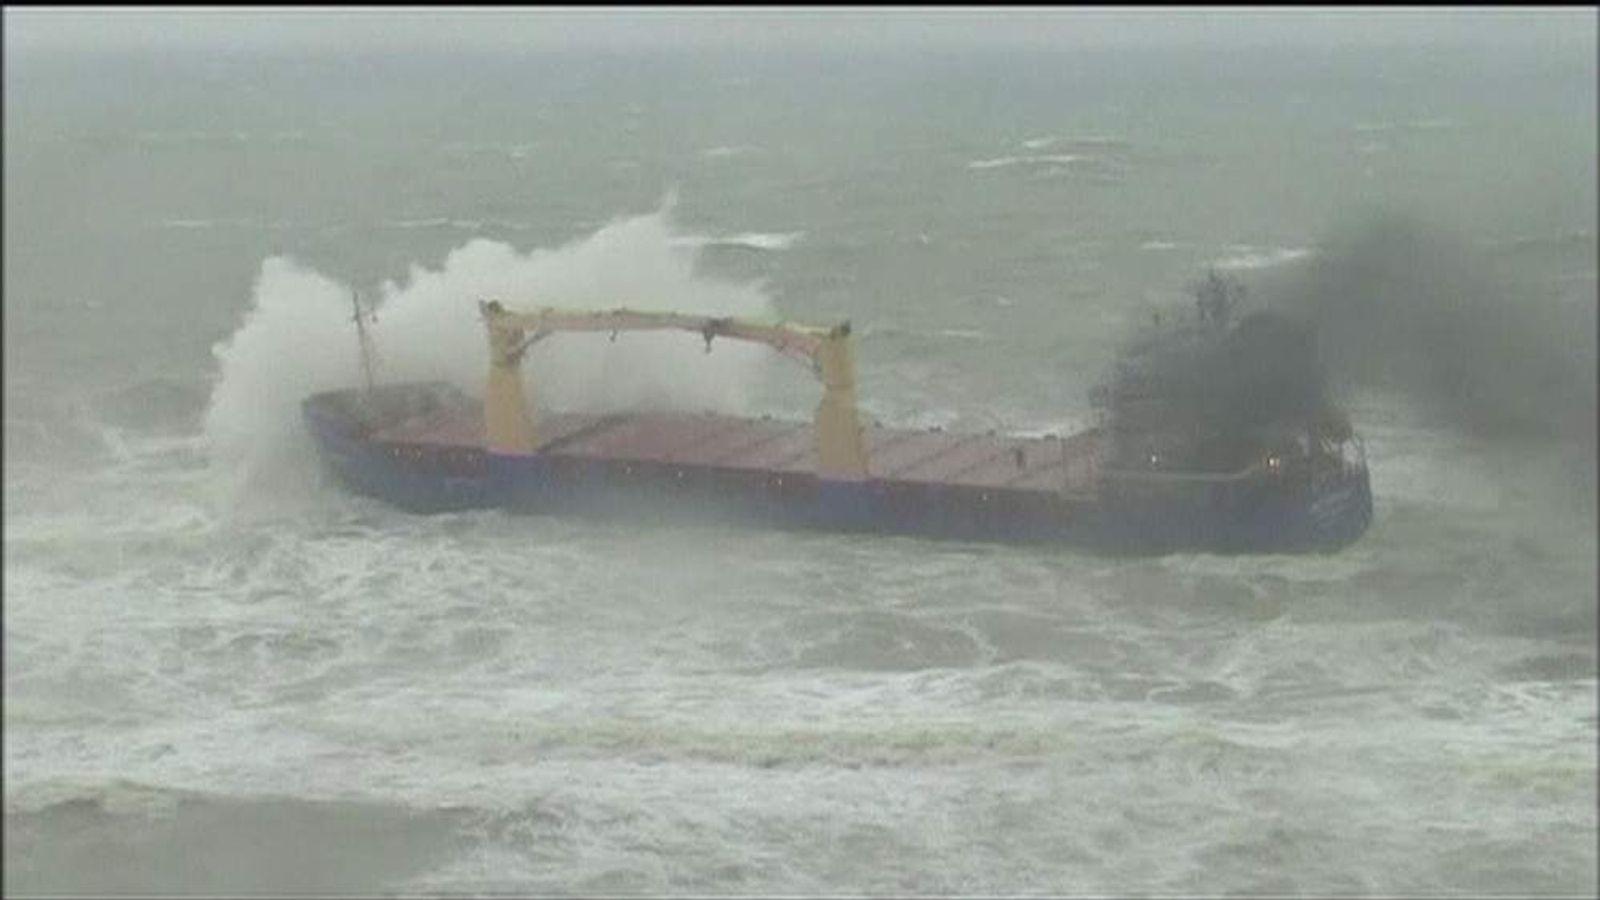 TURKEY Cargo Ship Runs Aground After Storms